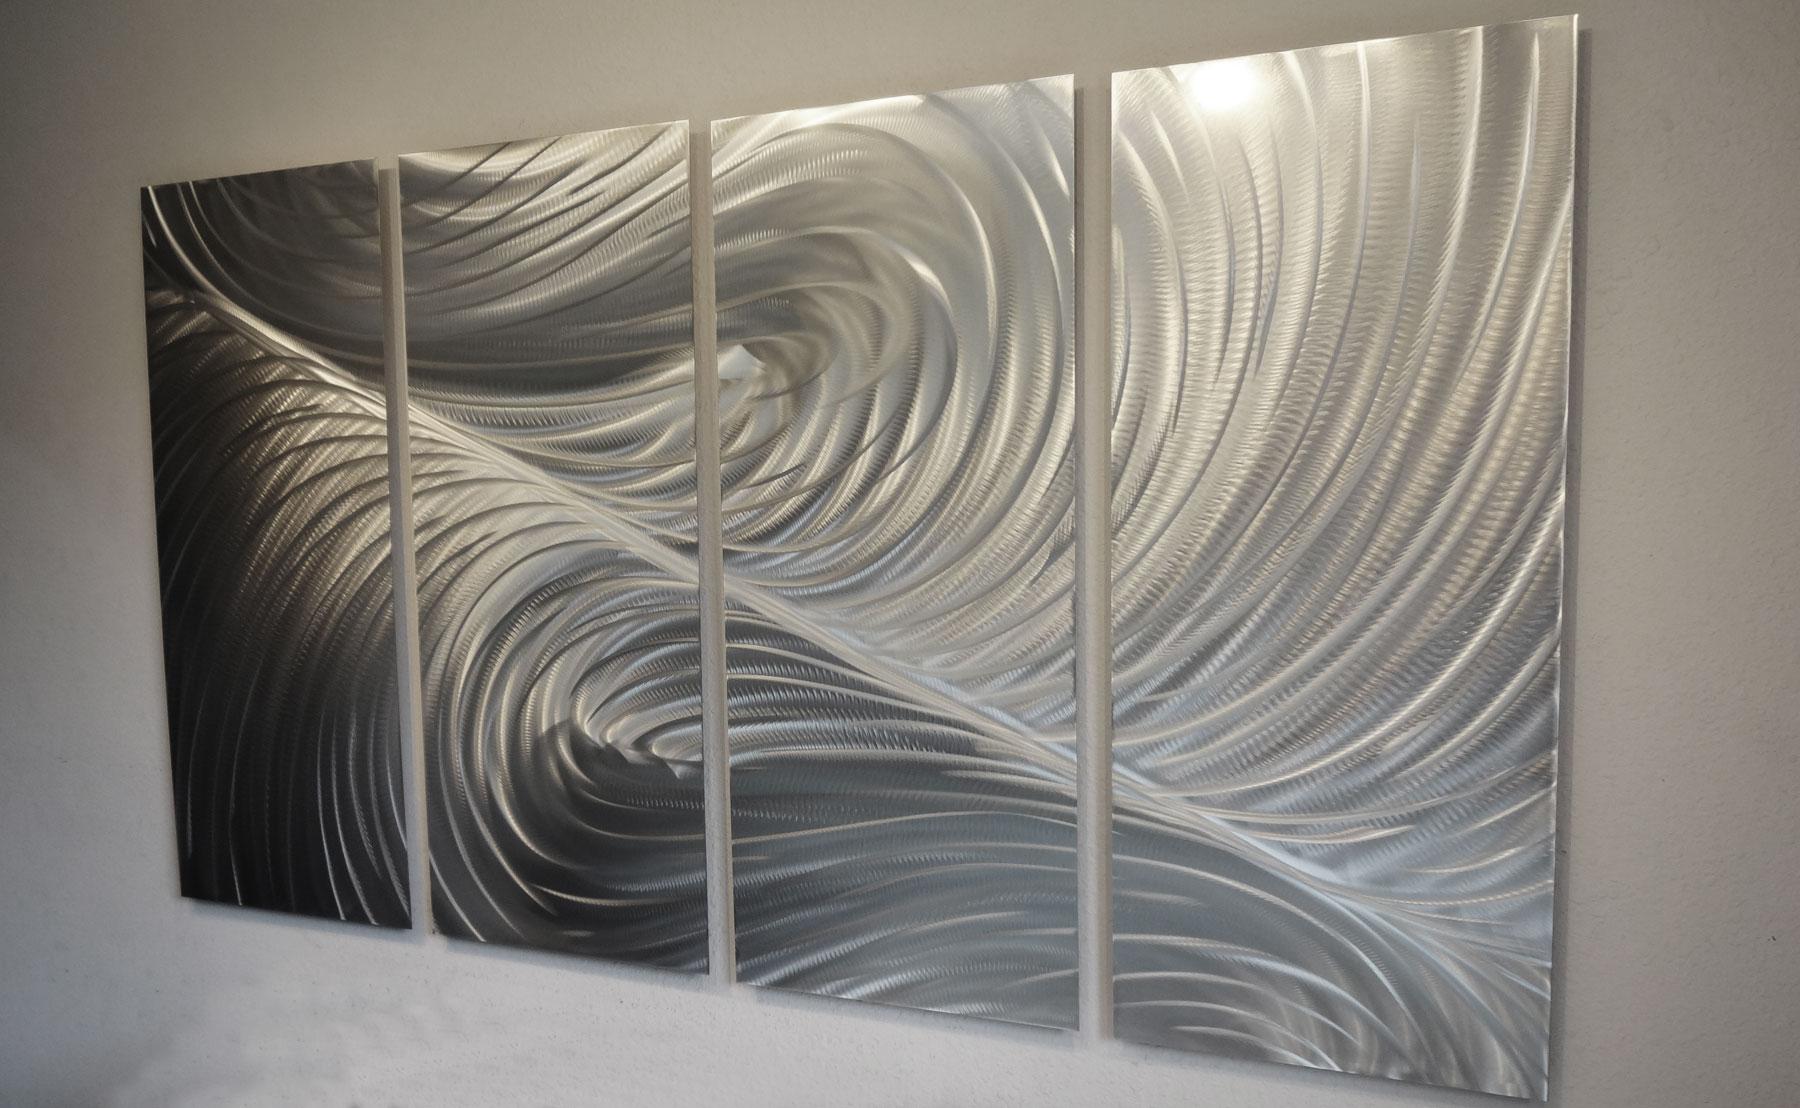 "Echo 36"" Tall- Metal Wall Art Abstract Contemporary Modern"